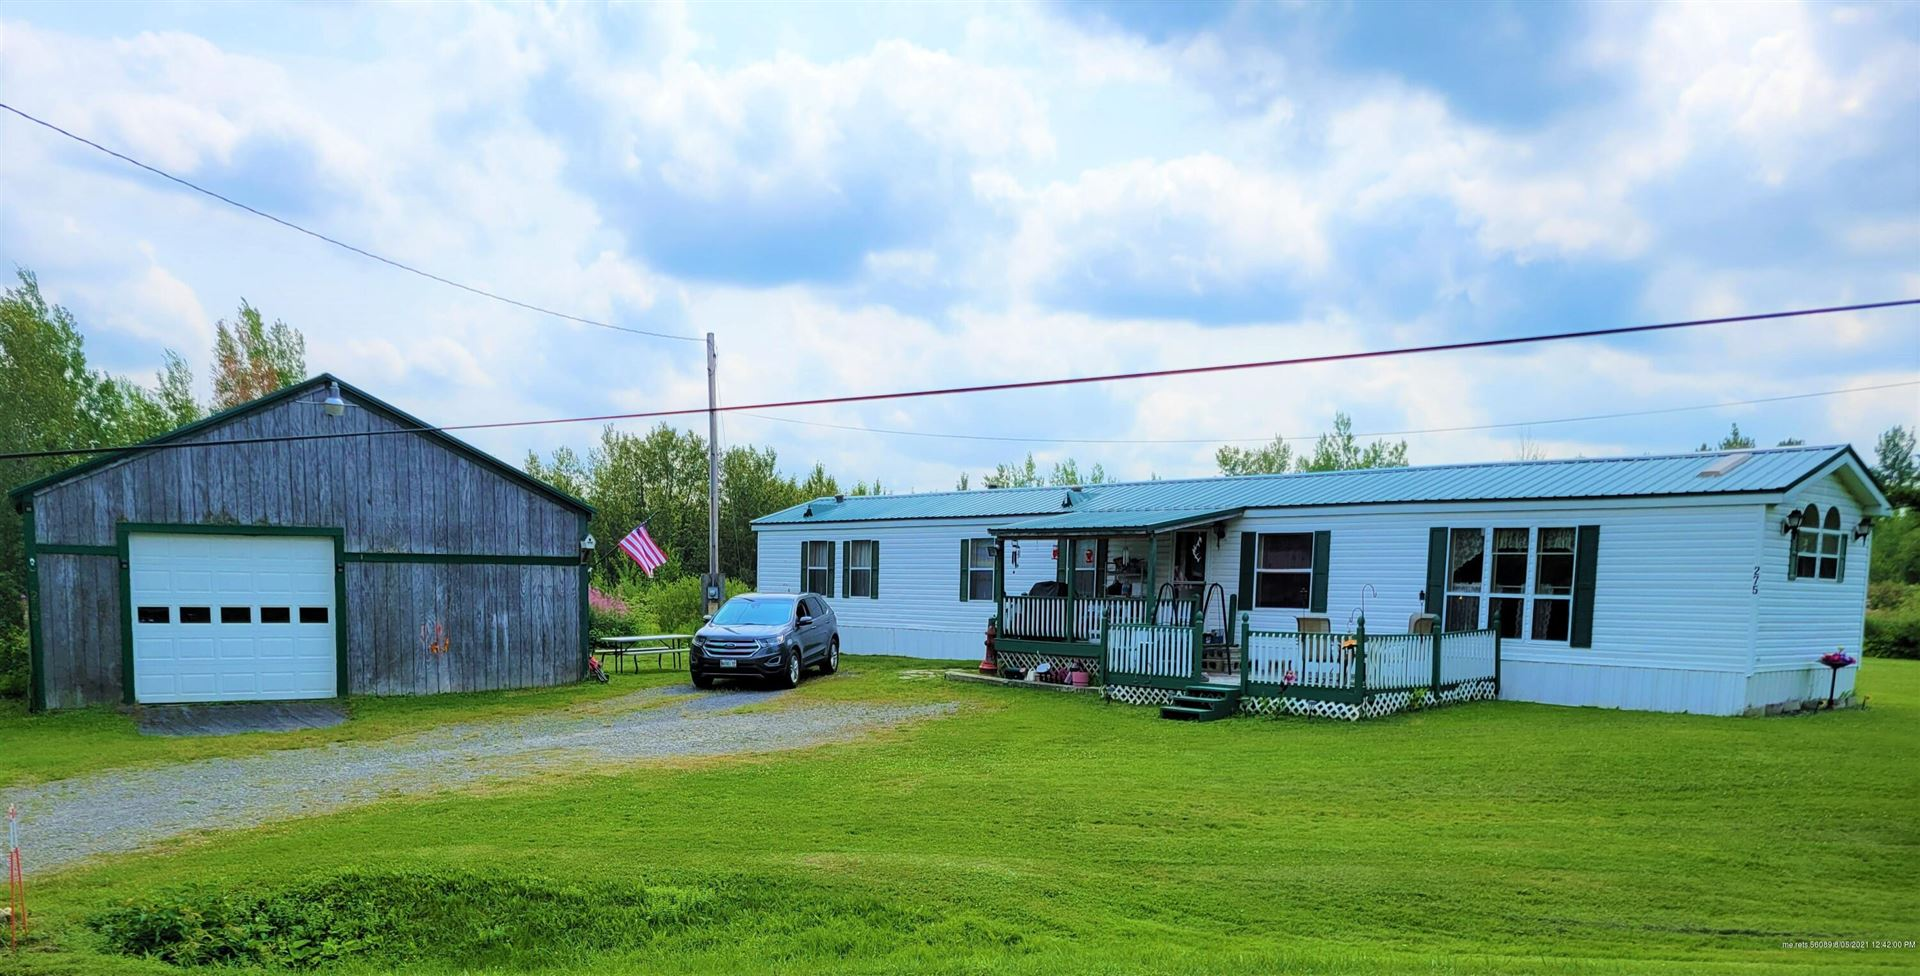 Photo of 275 Green Ridge Road, Fort Fairfield, ME 04742 (MLS # 1503765)